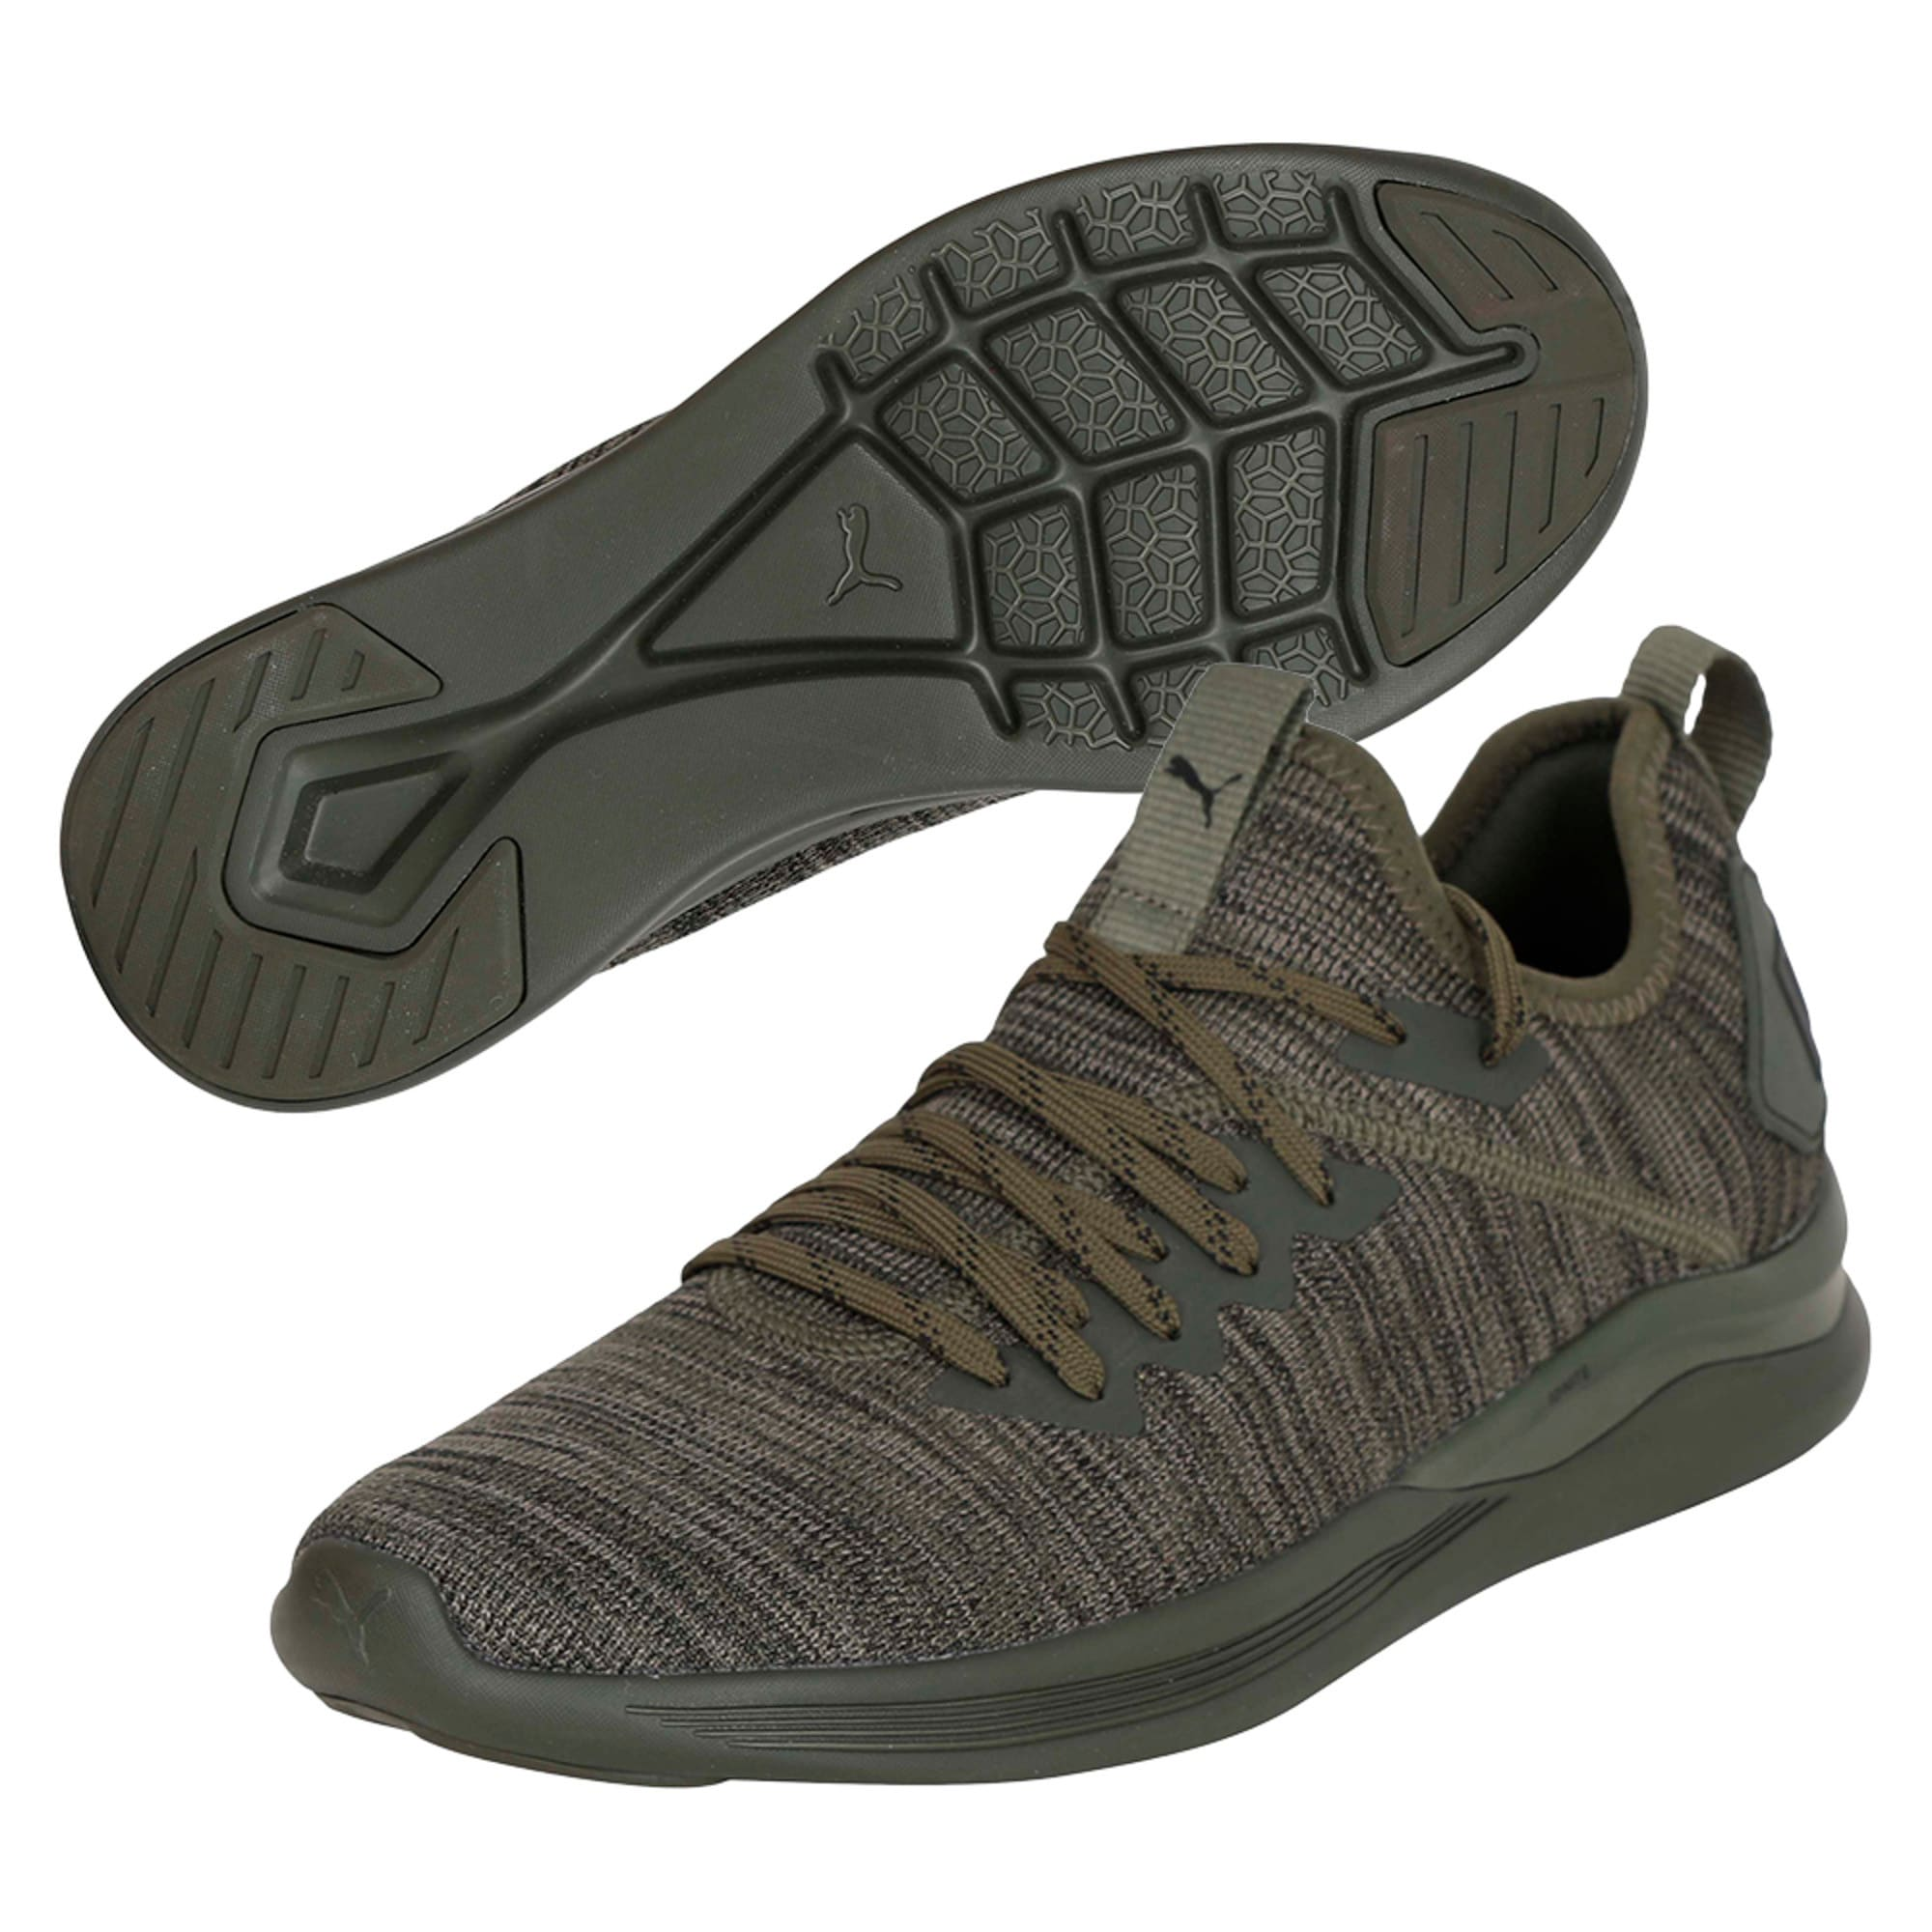 Thumbnail 6 of IGNITE Flash evoKNIT Men's Training Shoes, Forest Night-Gray-Black, medium-IND